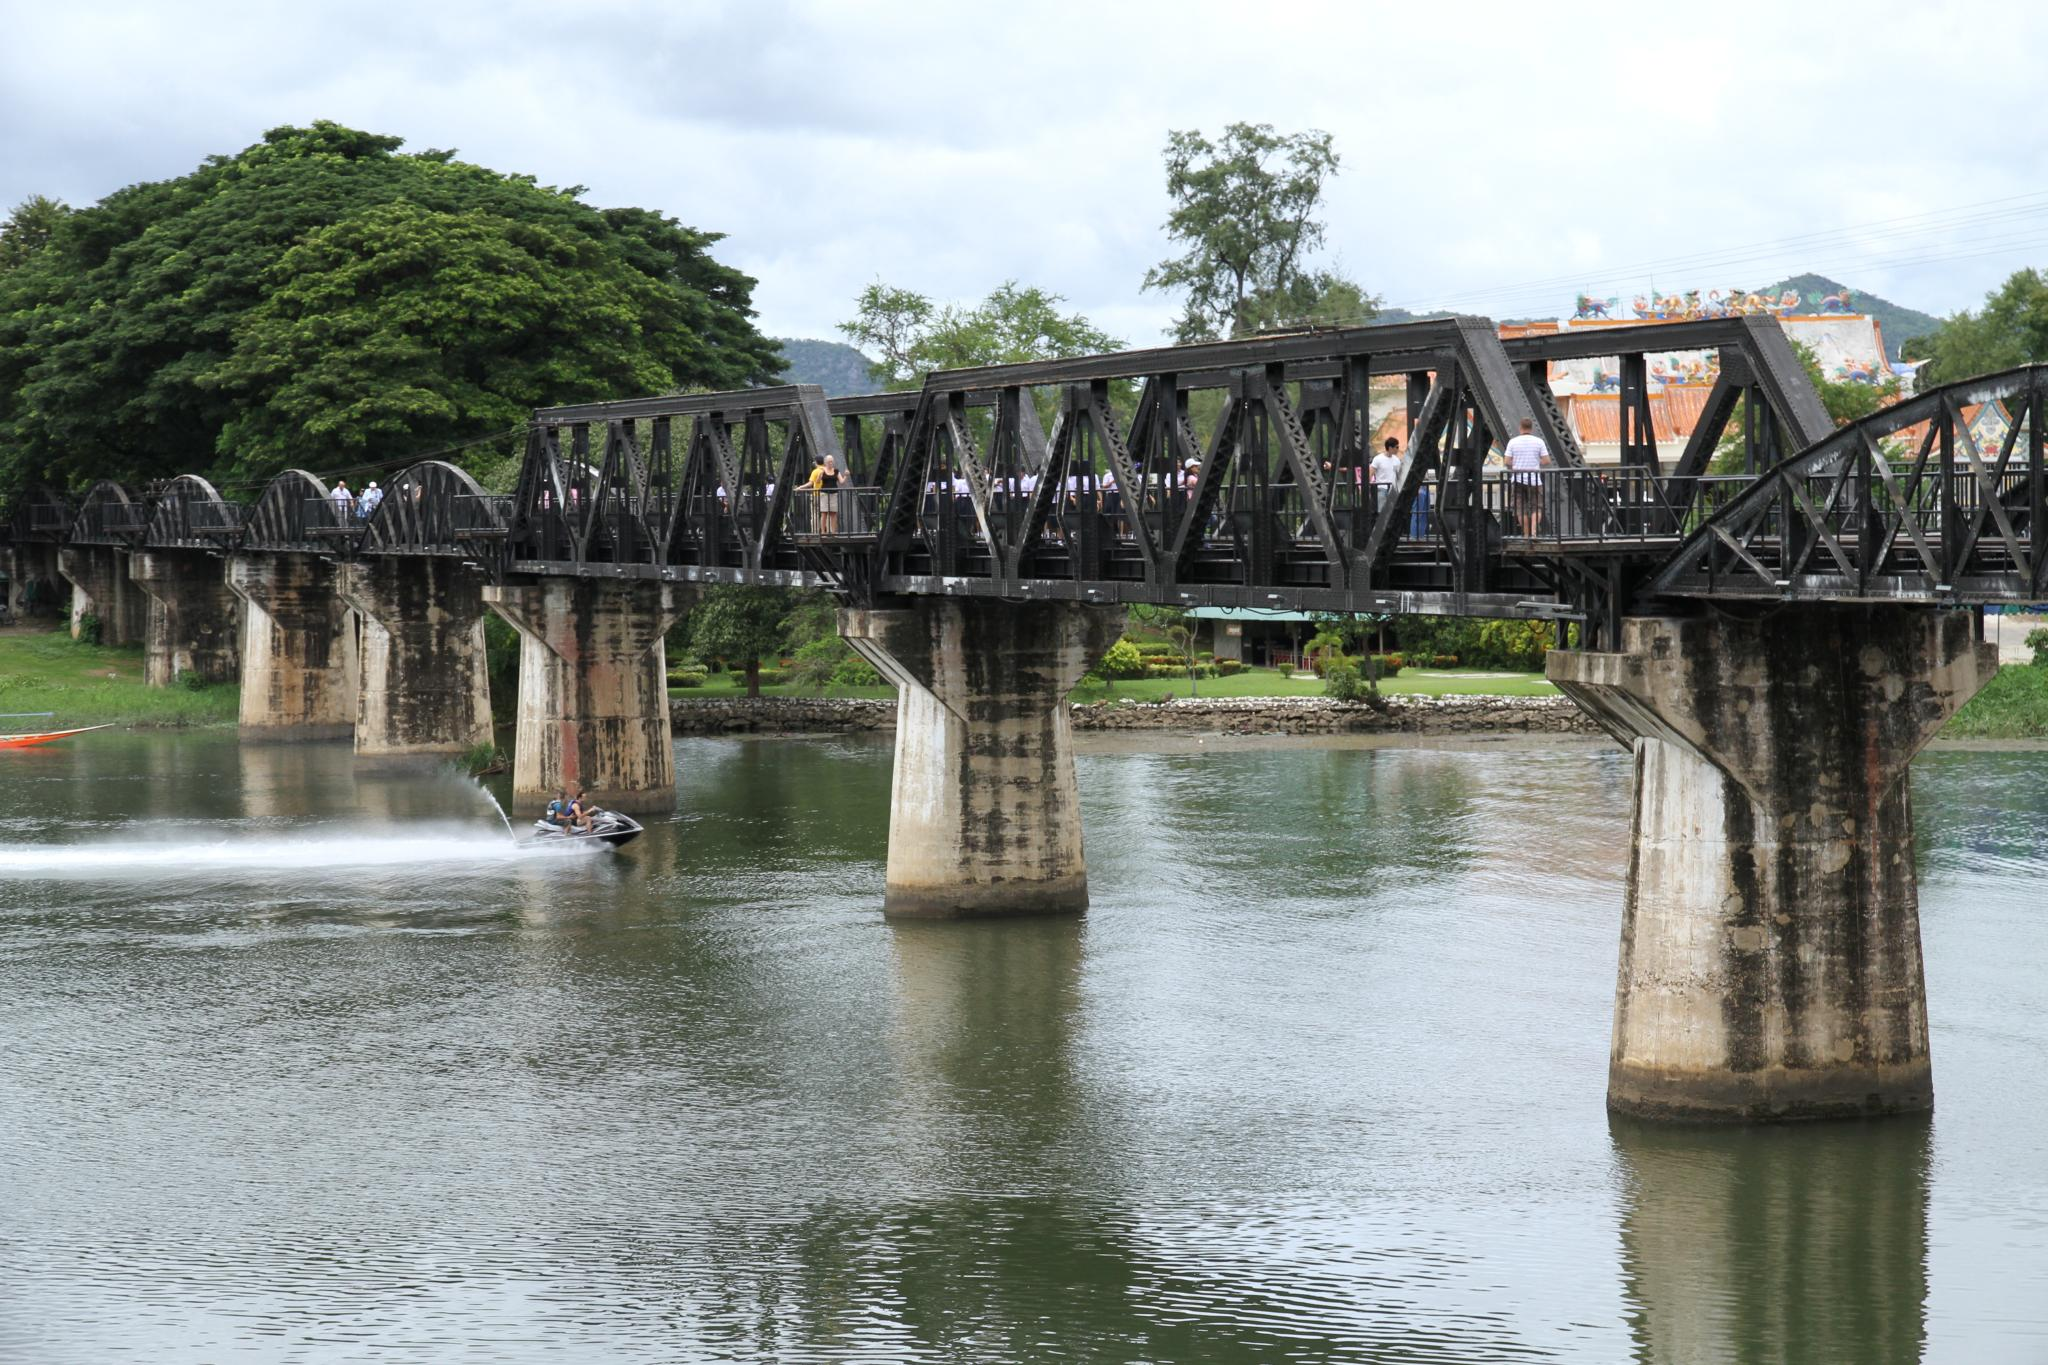 File:Bridge over the river Kwai 2527.jpg